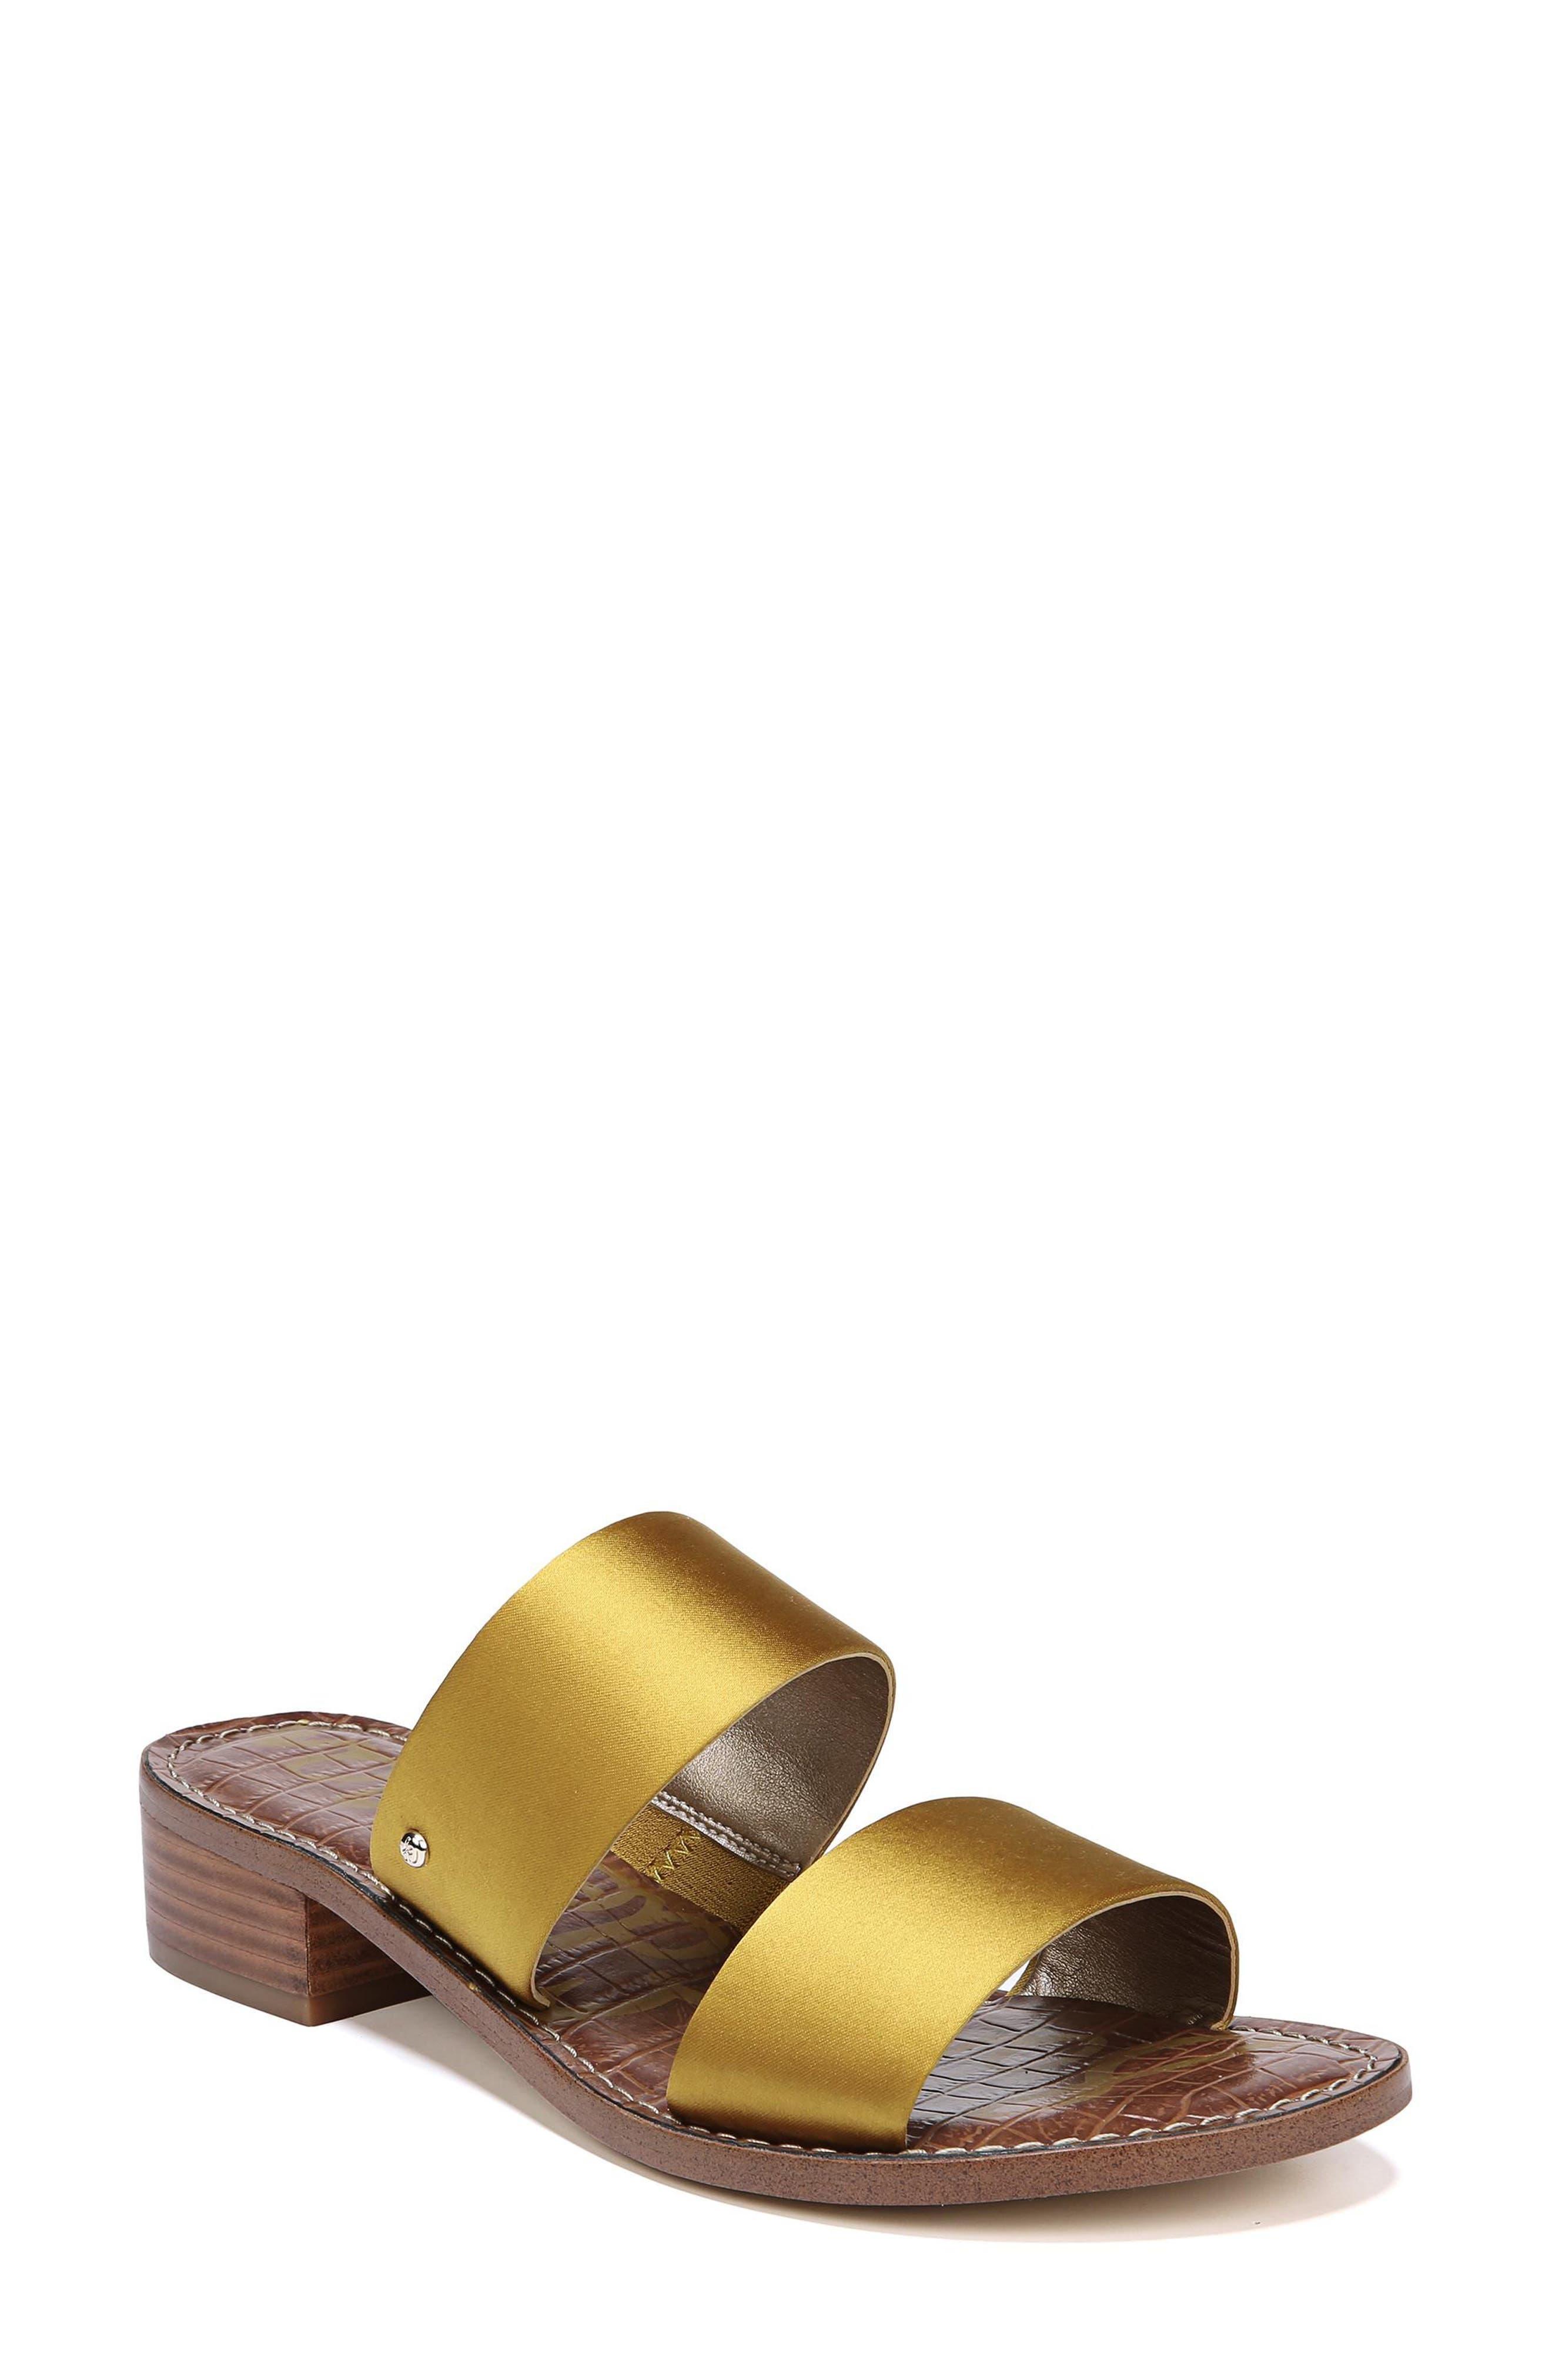 Jeni Sandal,                         Main,                         color, TUSCAN YELLOW SATIN